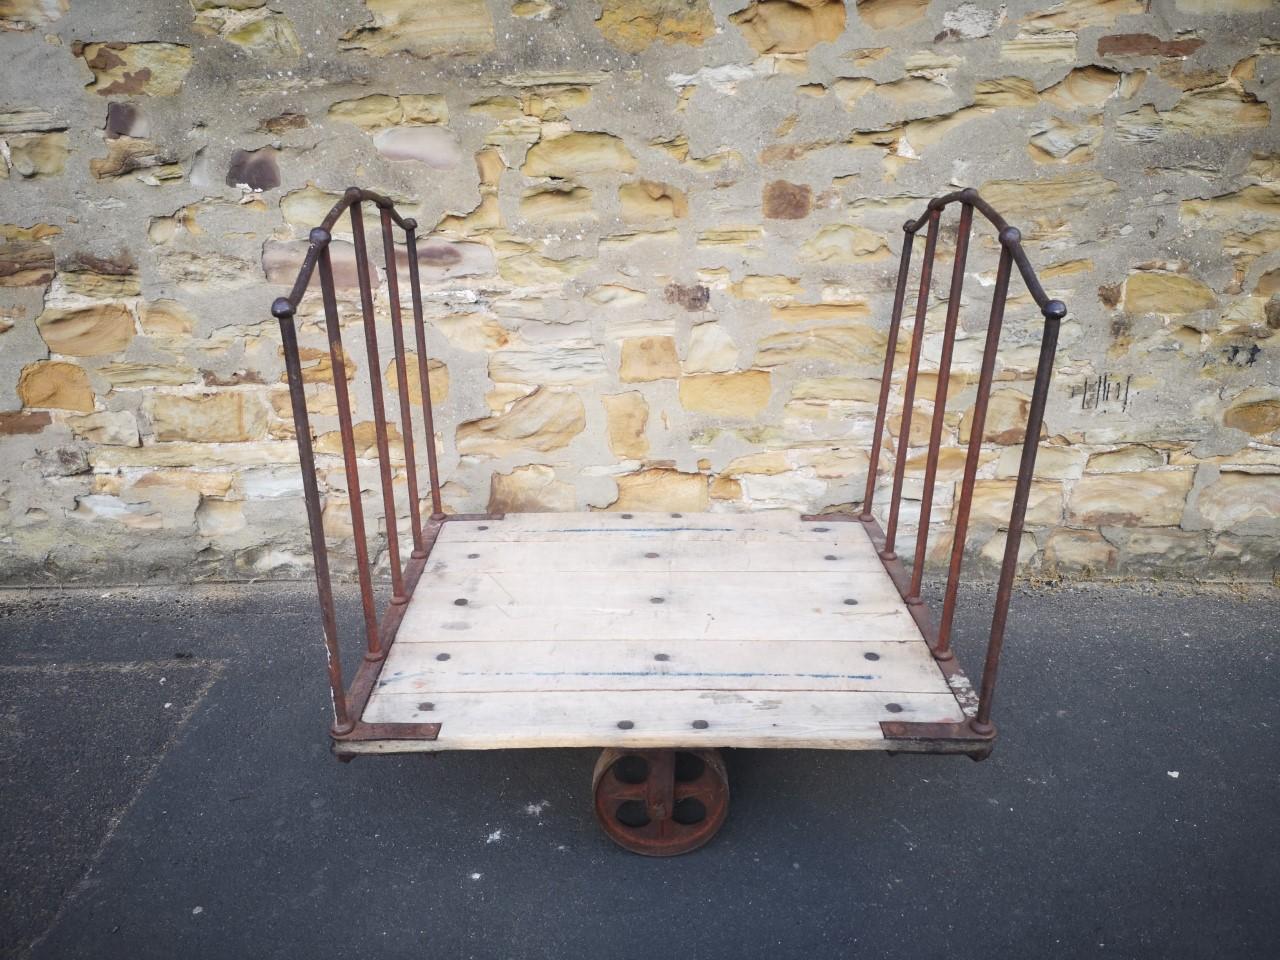 Late 19th century Mill cart画像